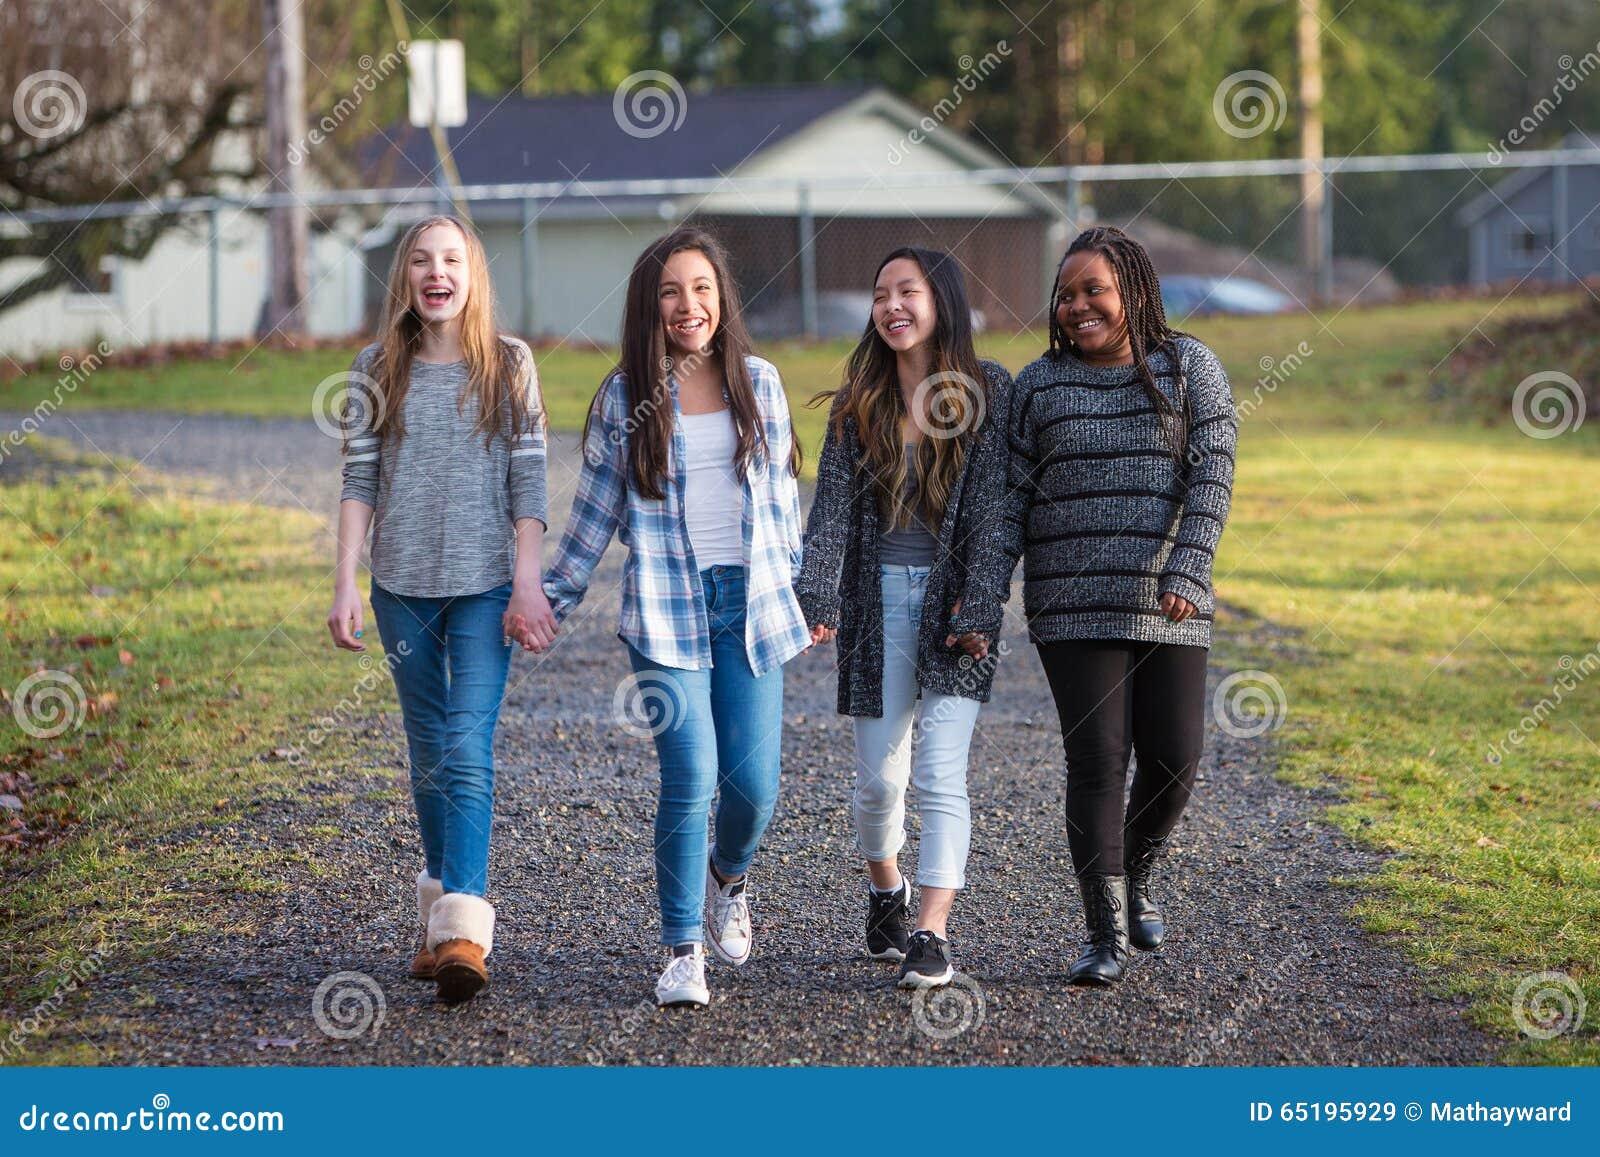 girls while